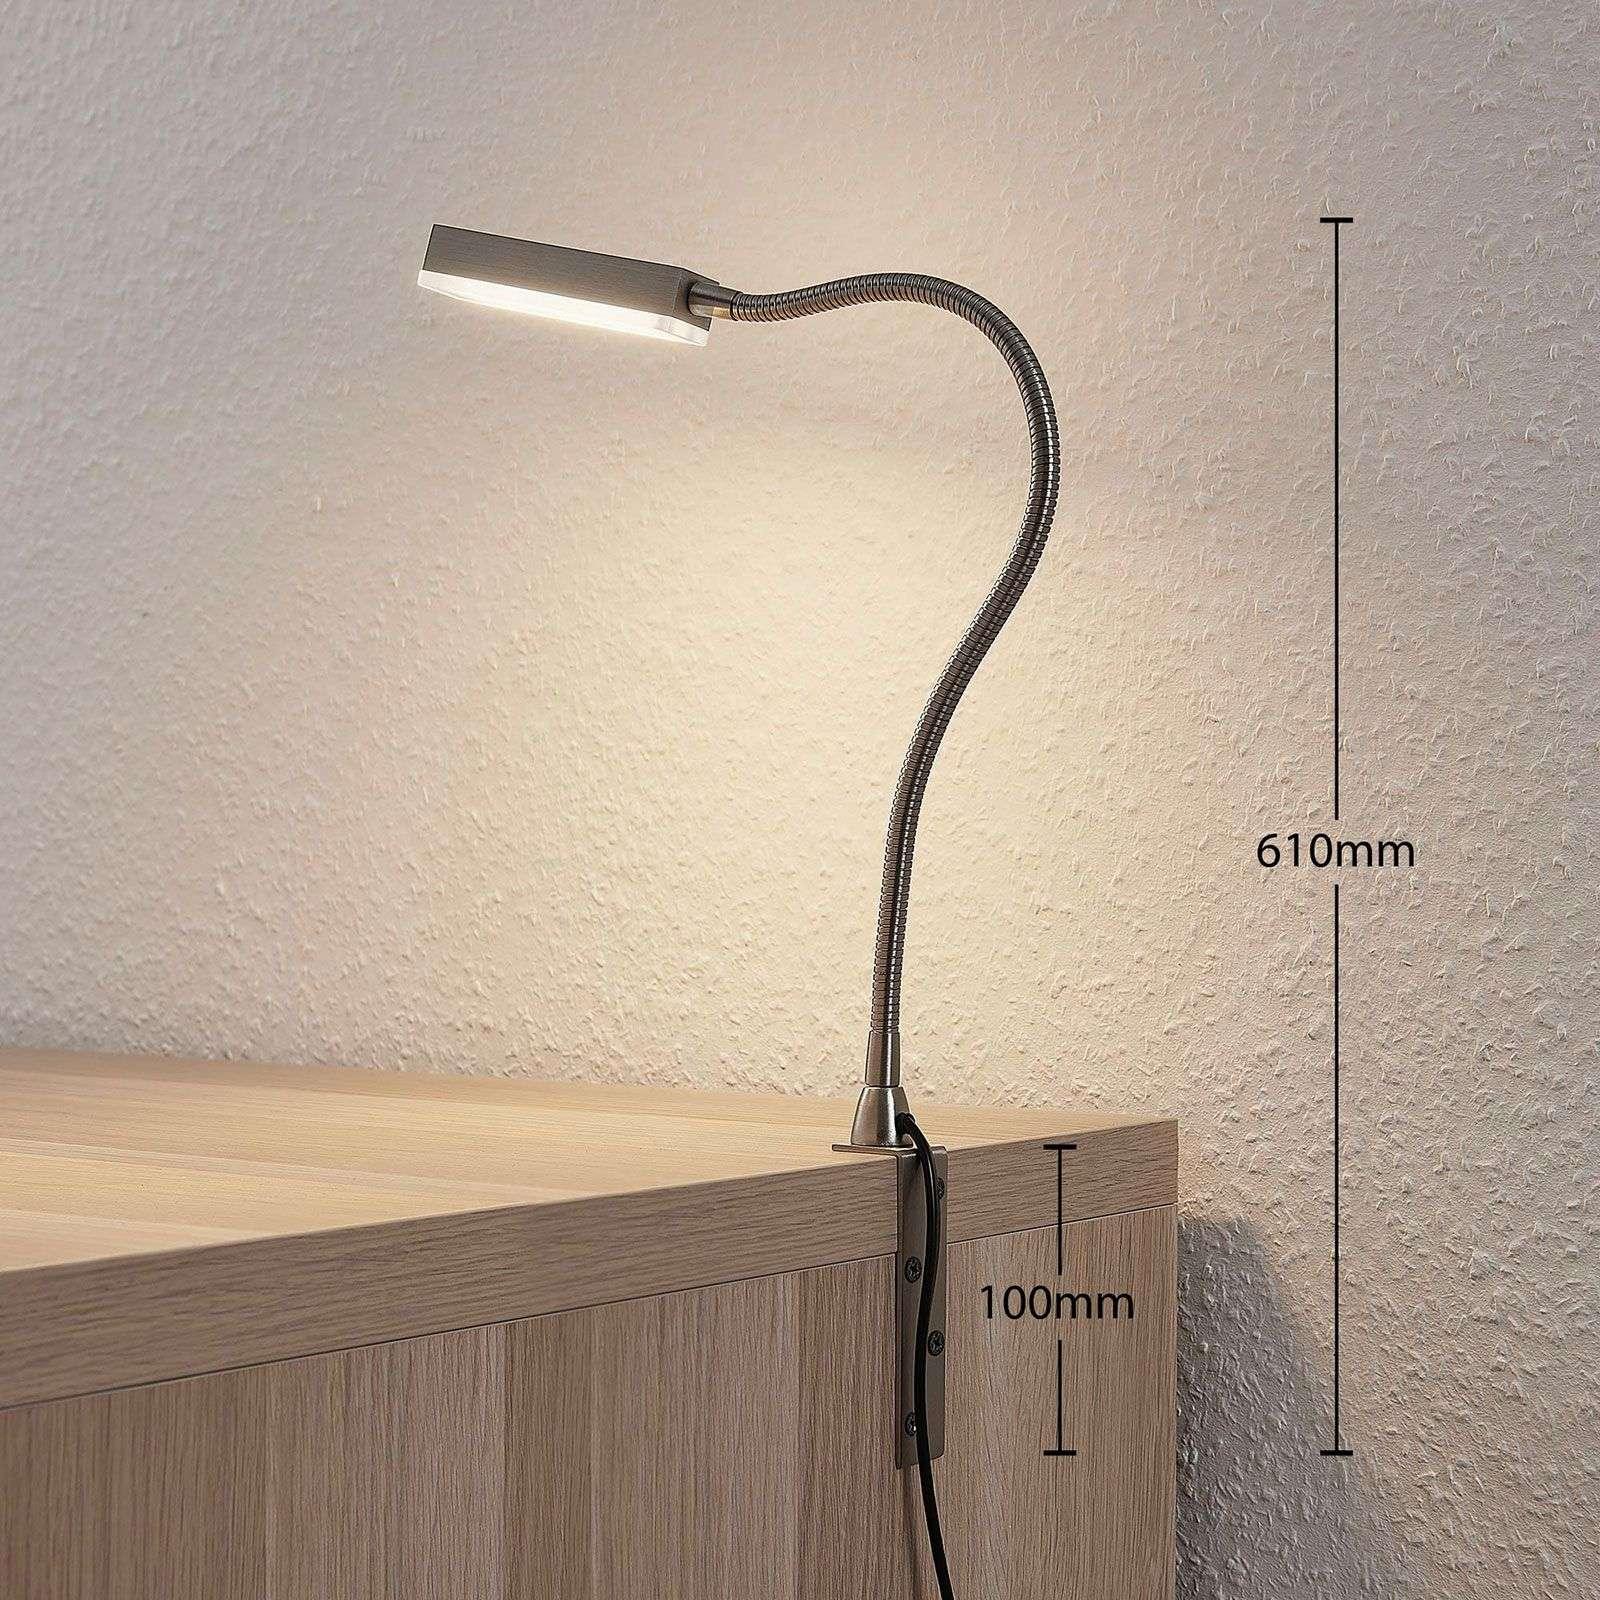 Full Size of Wandlampe Schlafzimmer Dimmbar Design Modern Mit Schalter Leselampe Wandleuchte Wandlampen Ikea Schwenkbar Led Holz Komplett Lattenrost Und Matratze Günstige Schlafzimmer Schlafzimmer Wandlampe